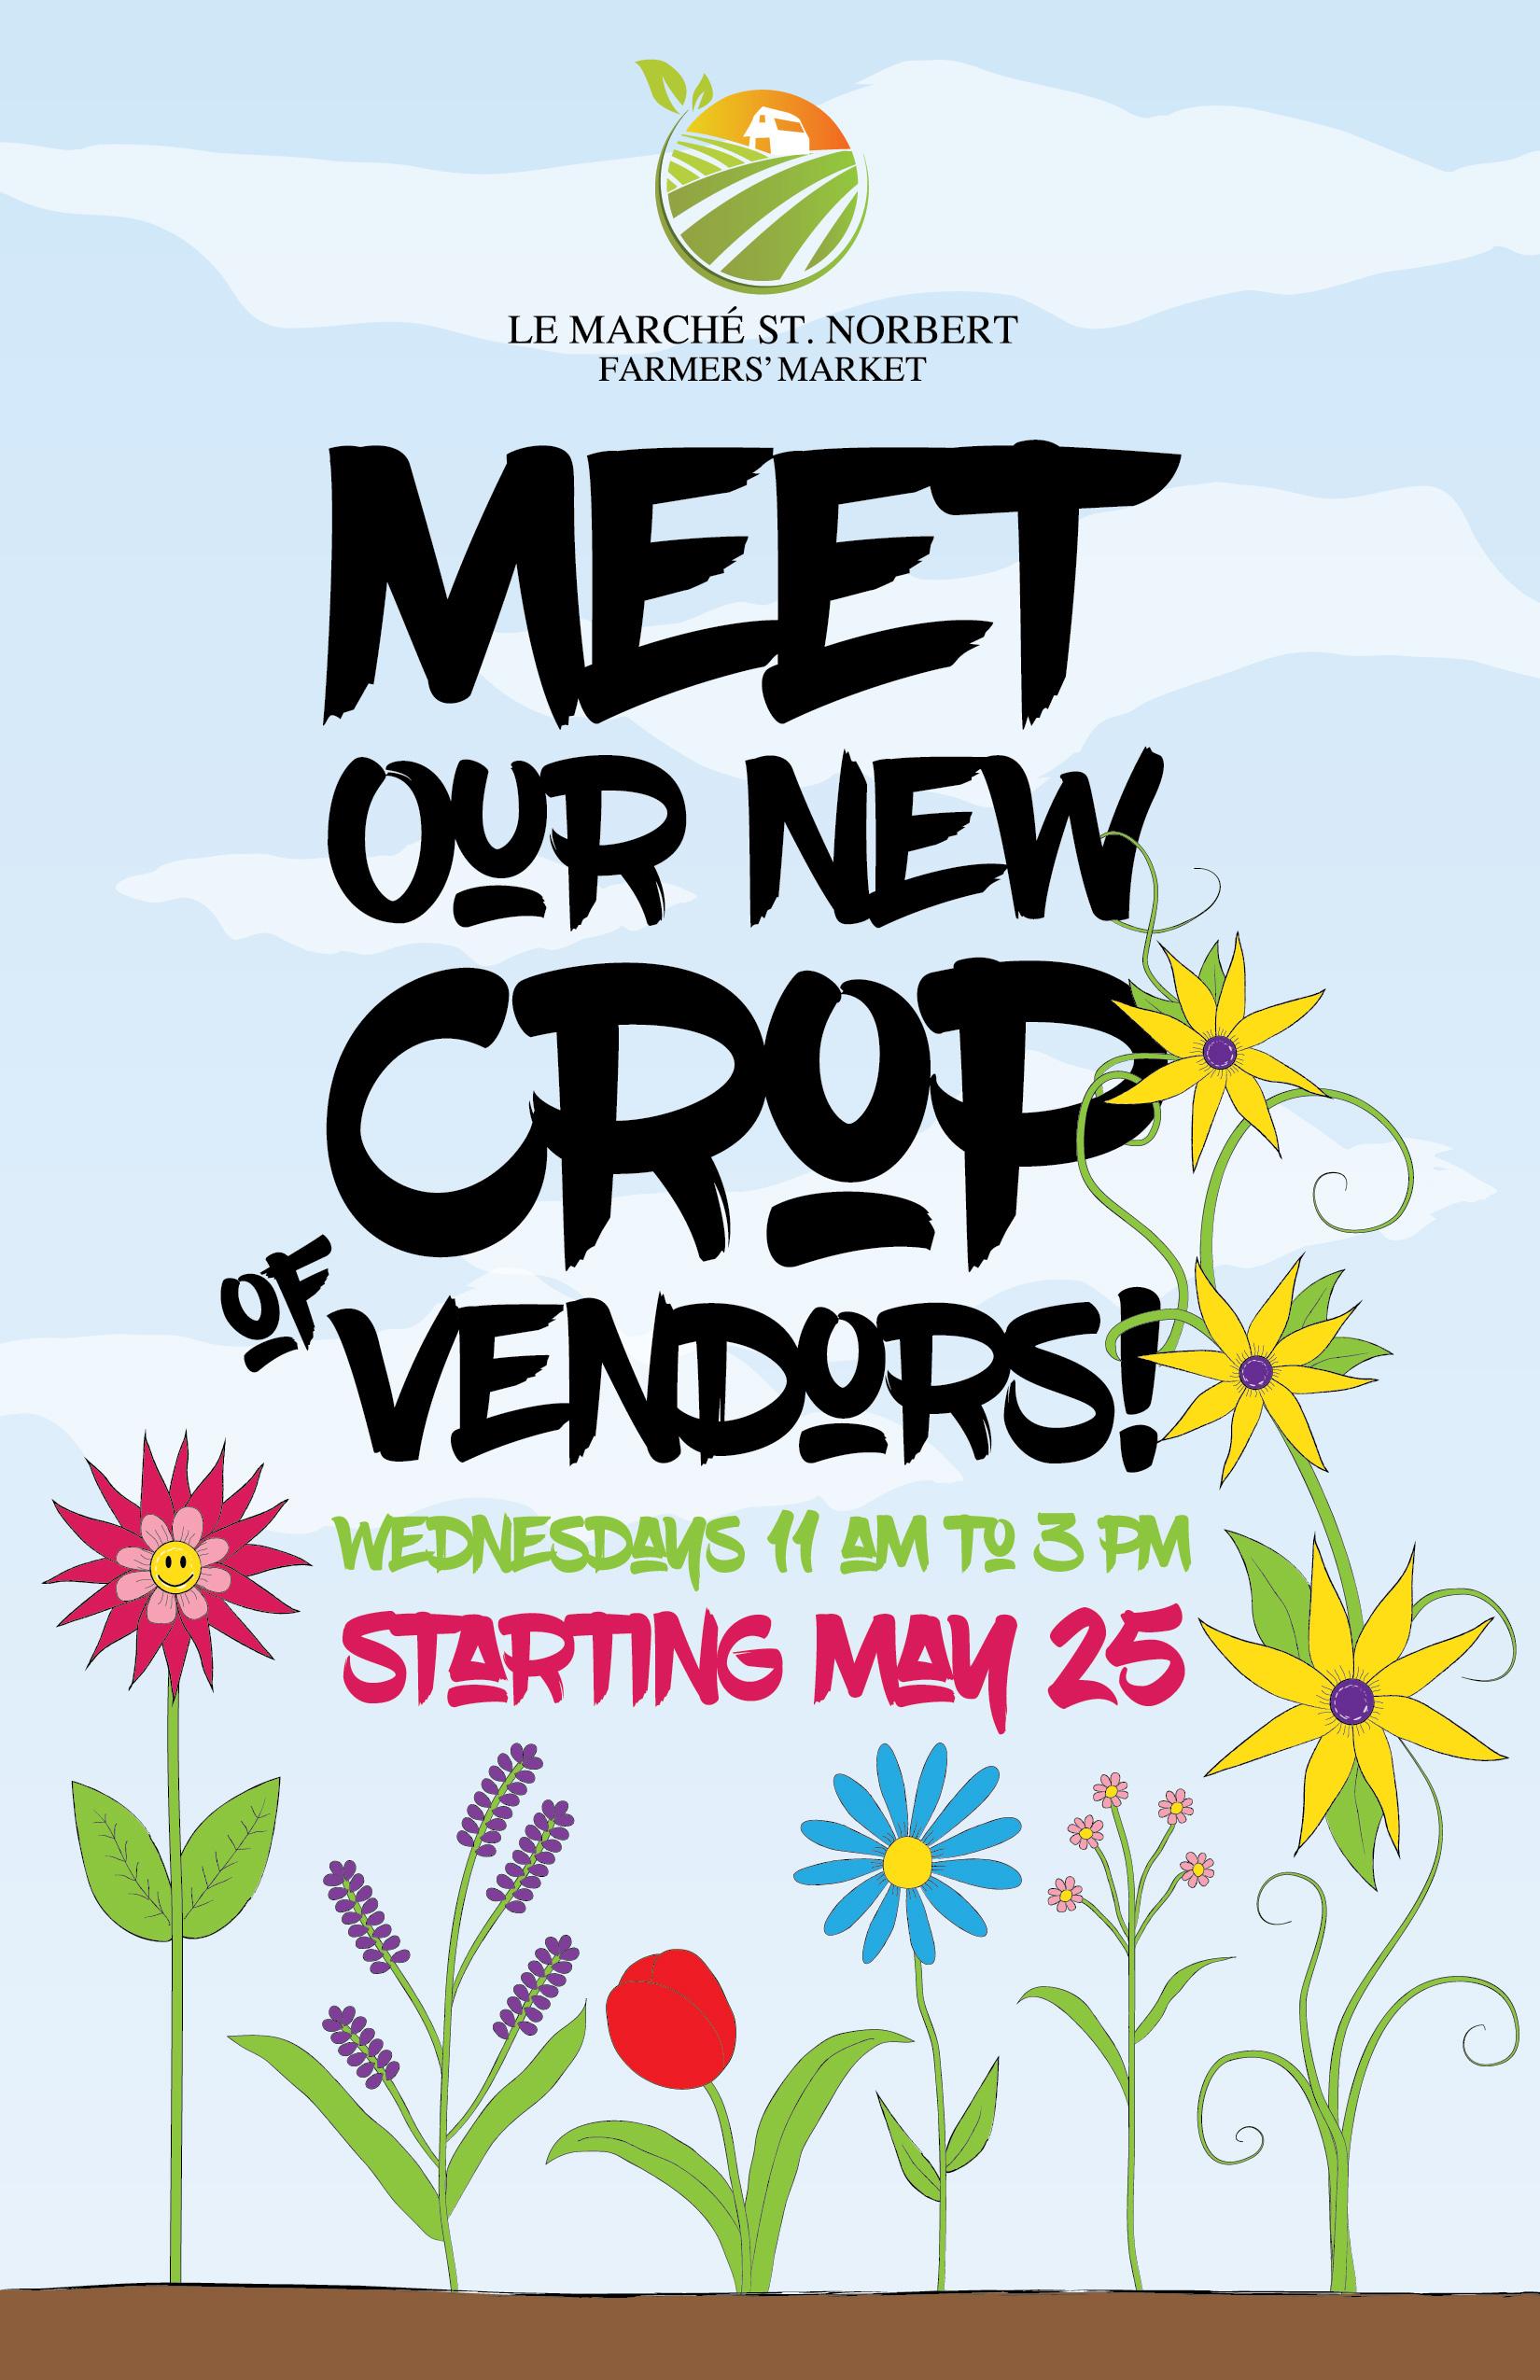 St. Norbert Farmers' Market – Vendor Poster